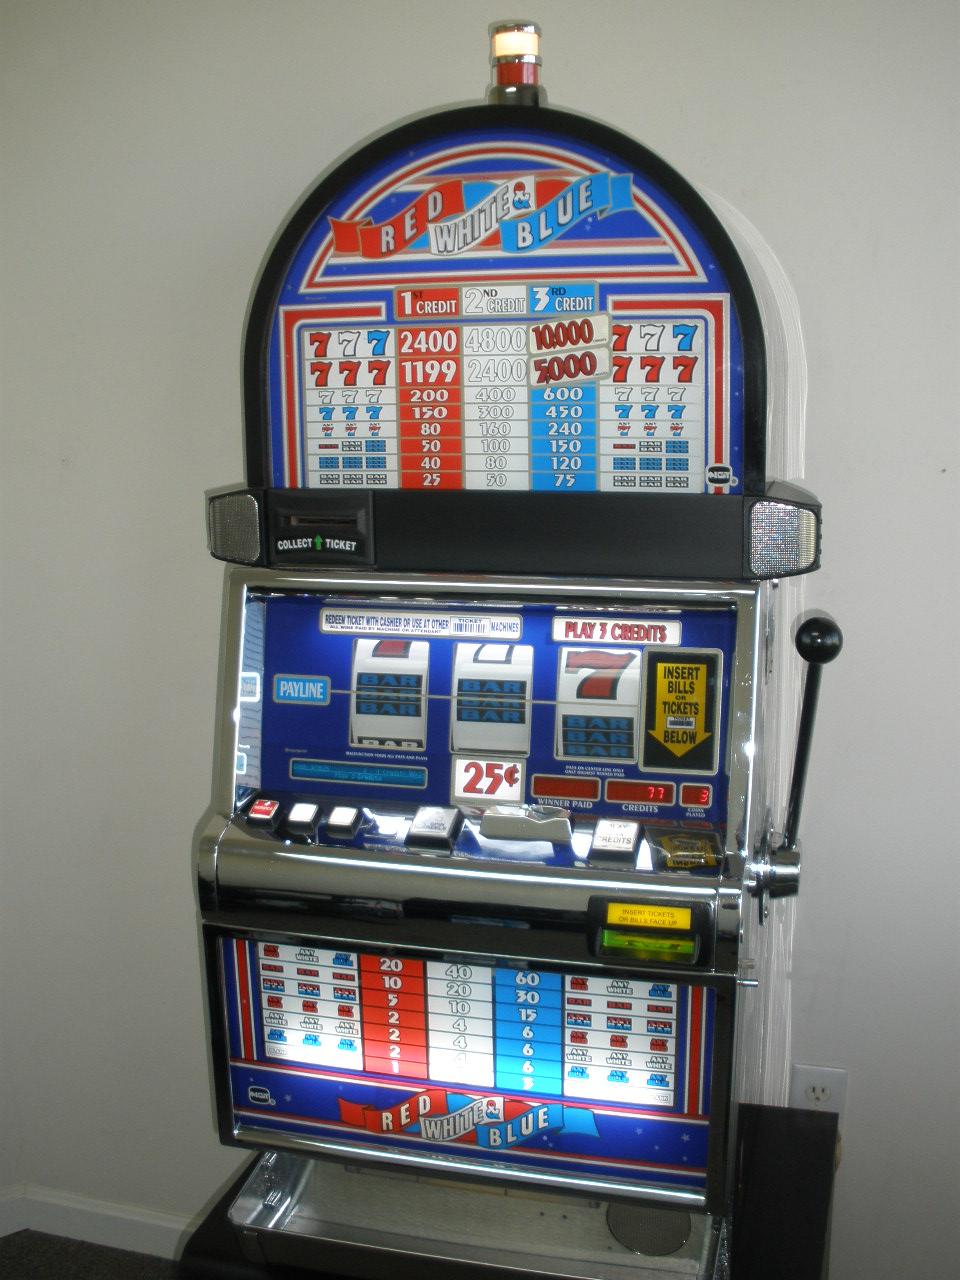 Spiele Red, White & Bleu - Video Slots Online